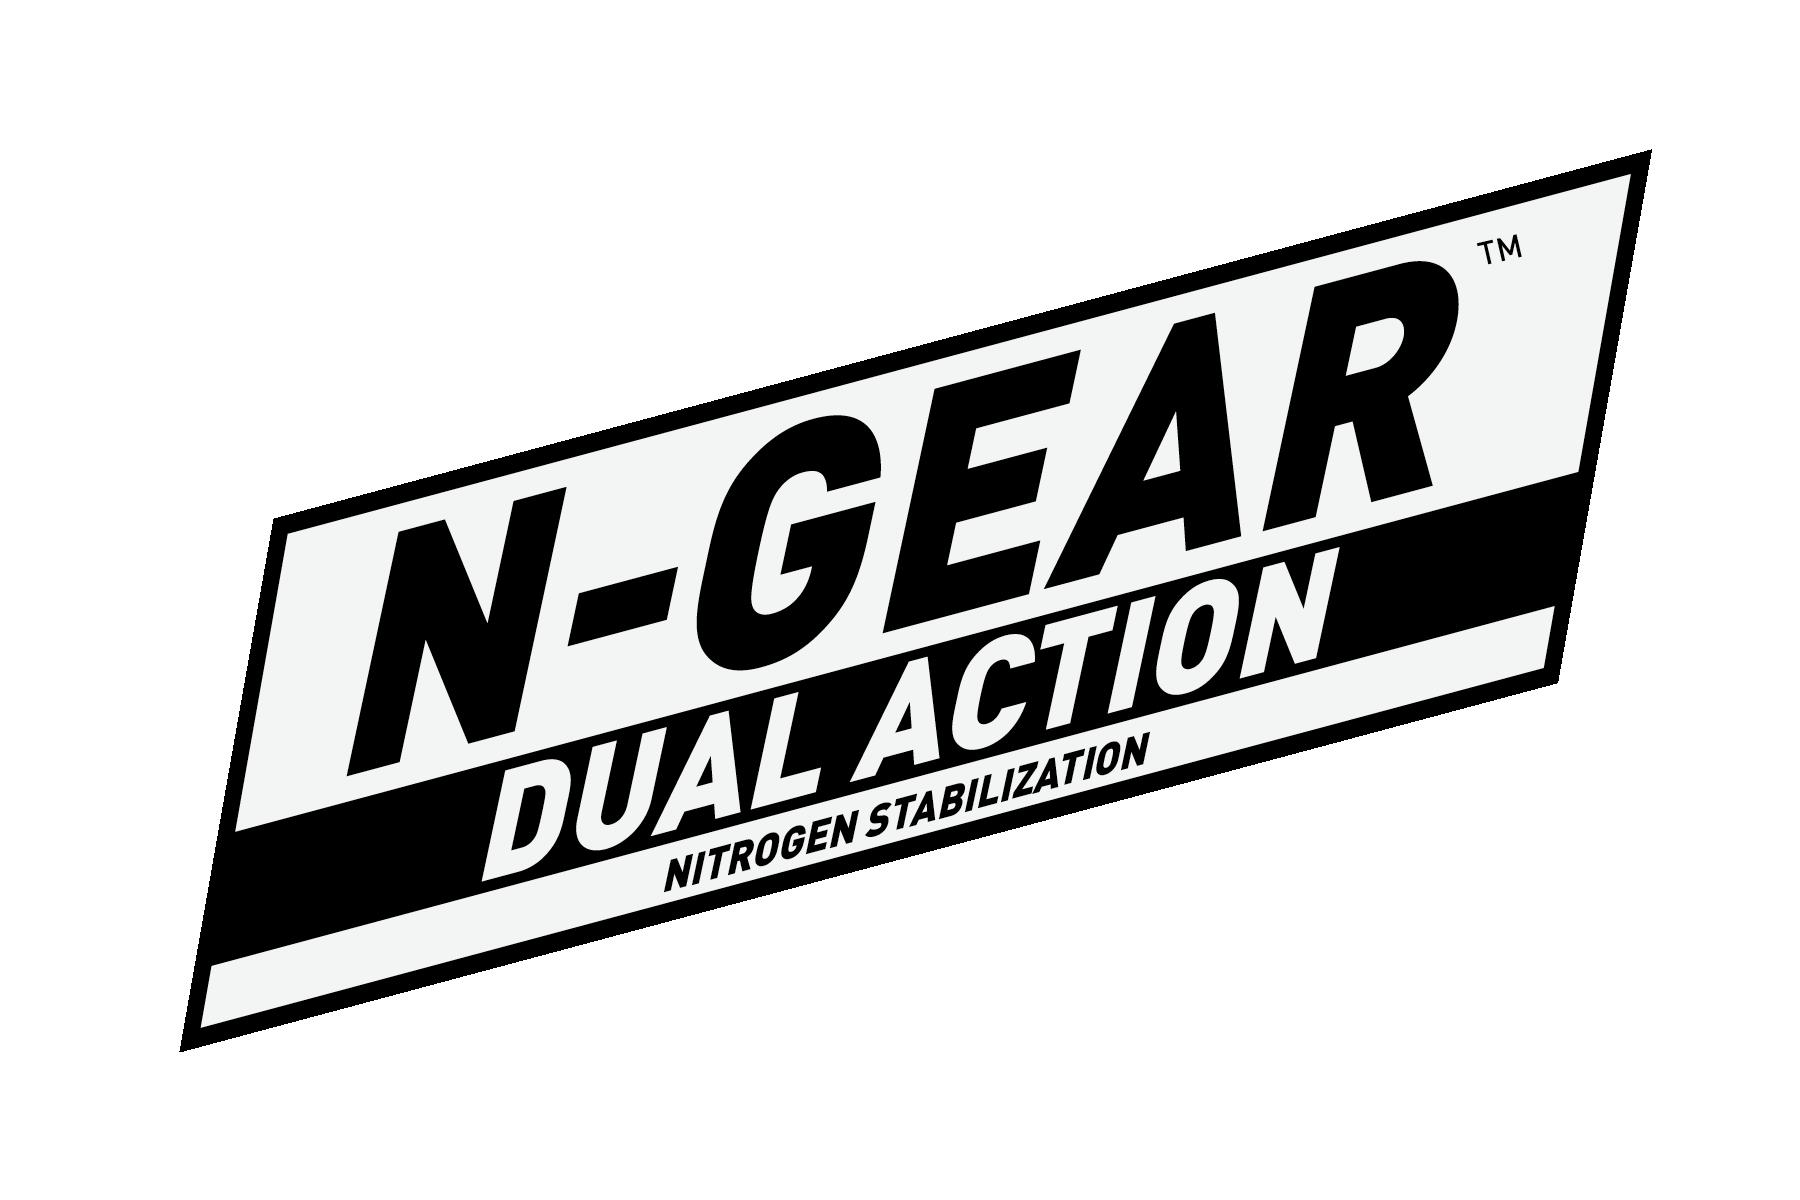 N-GEAR DUAL ACTION